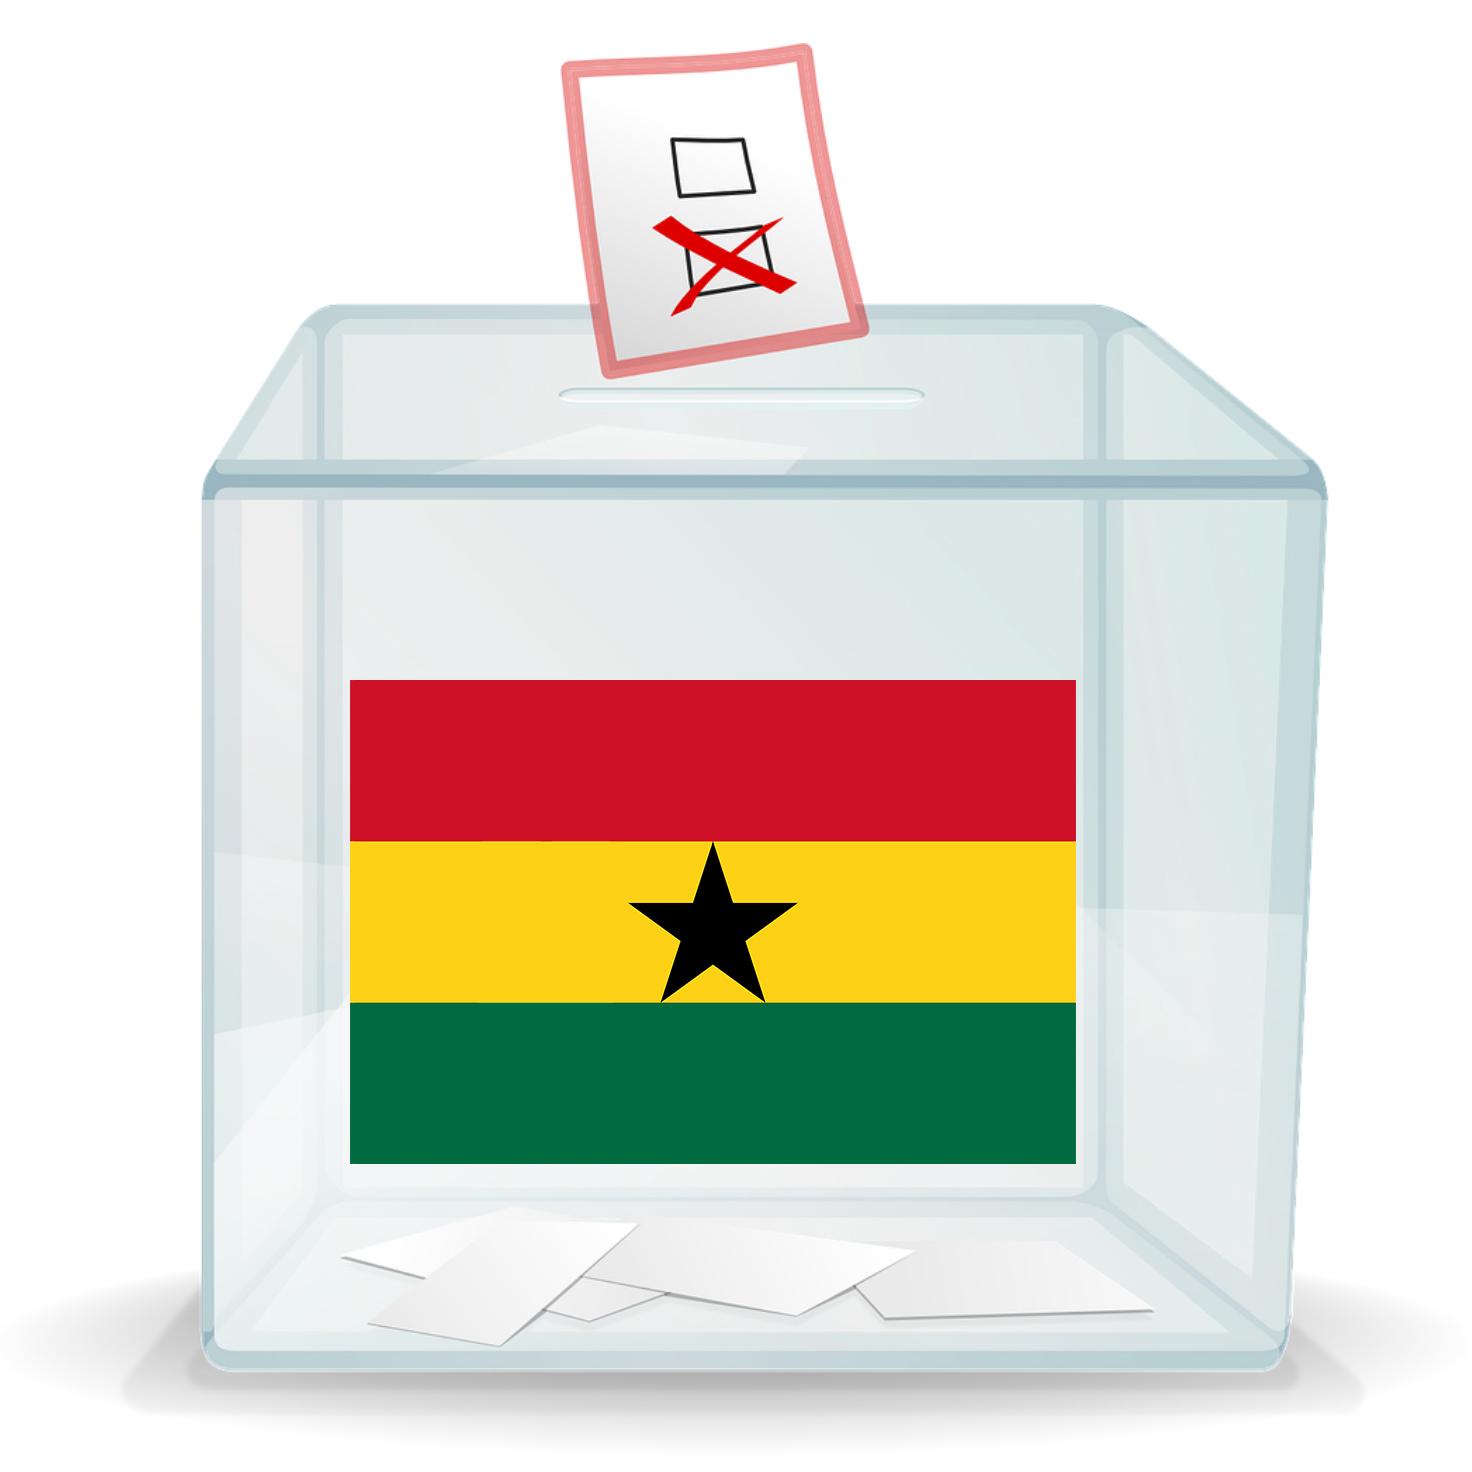 Ballot box with image of Ghana flag on it